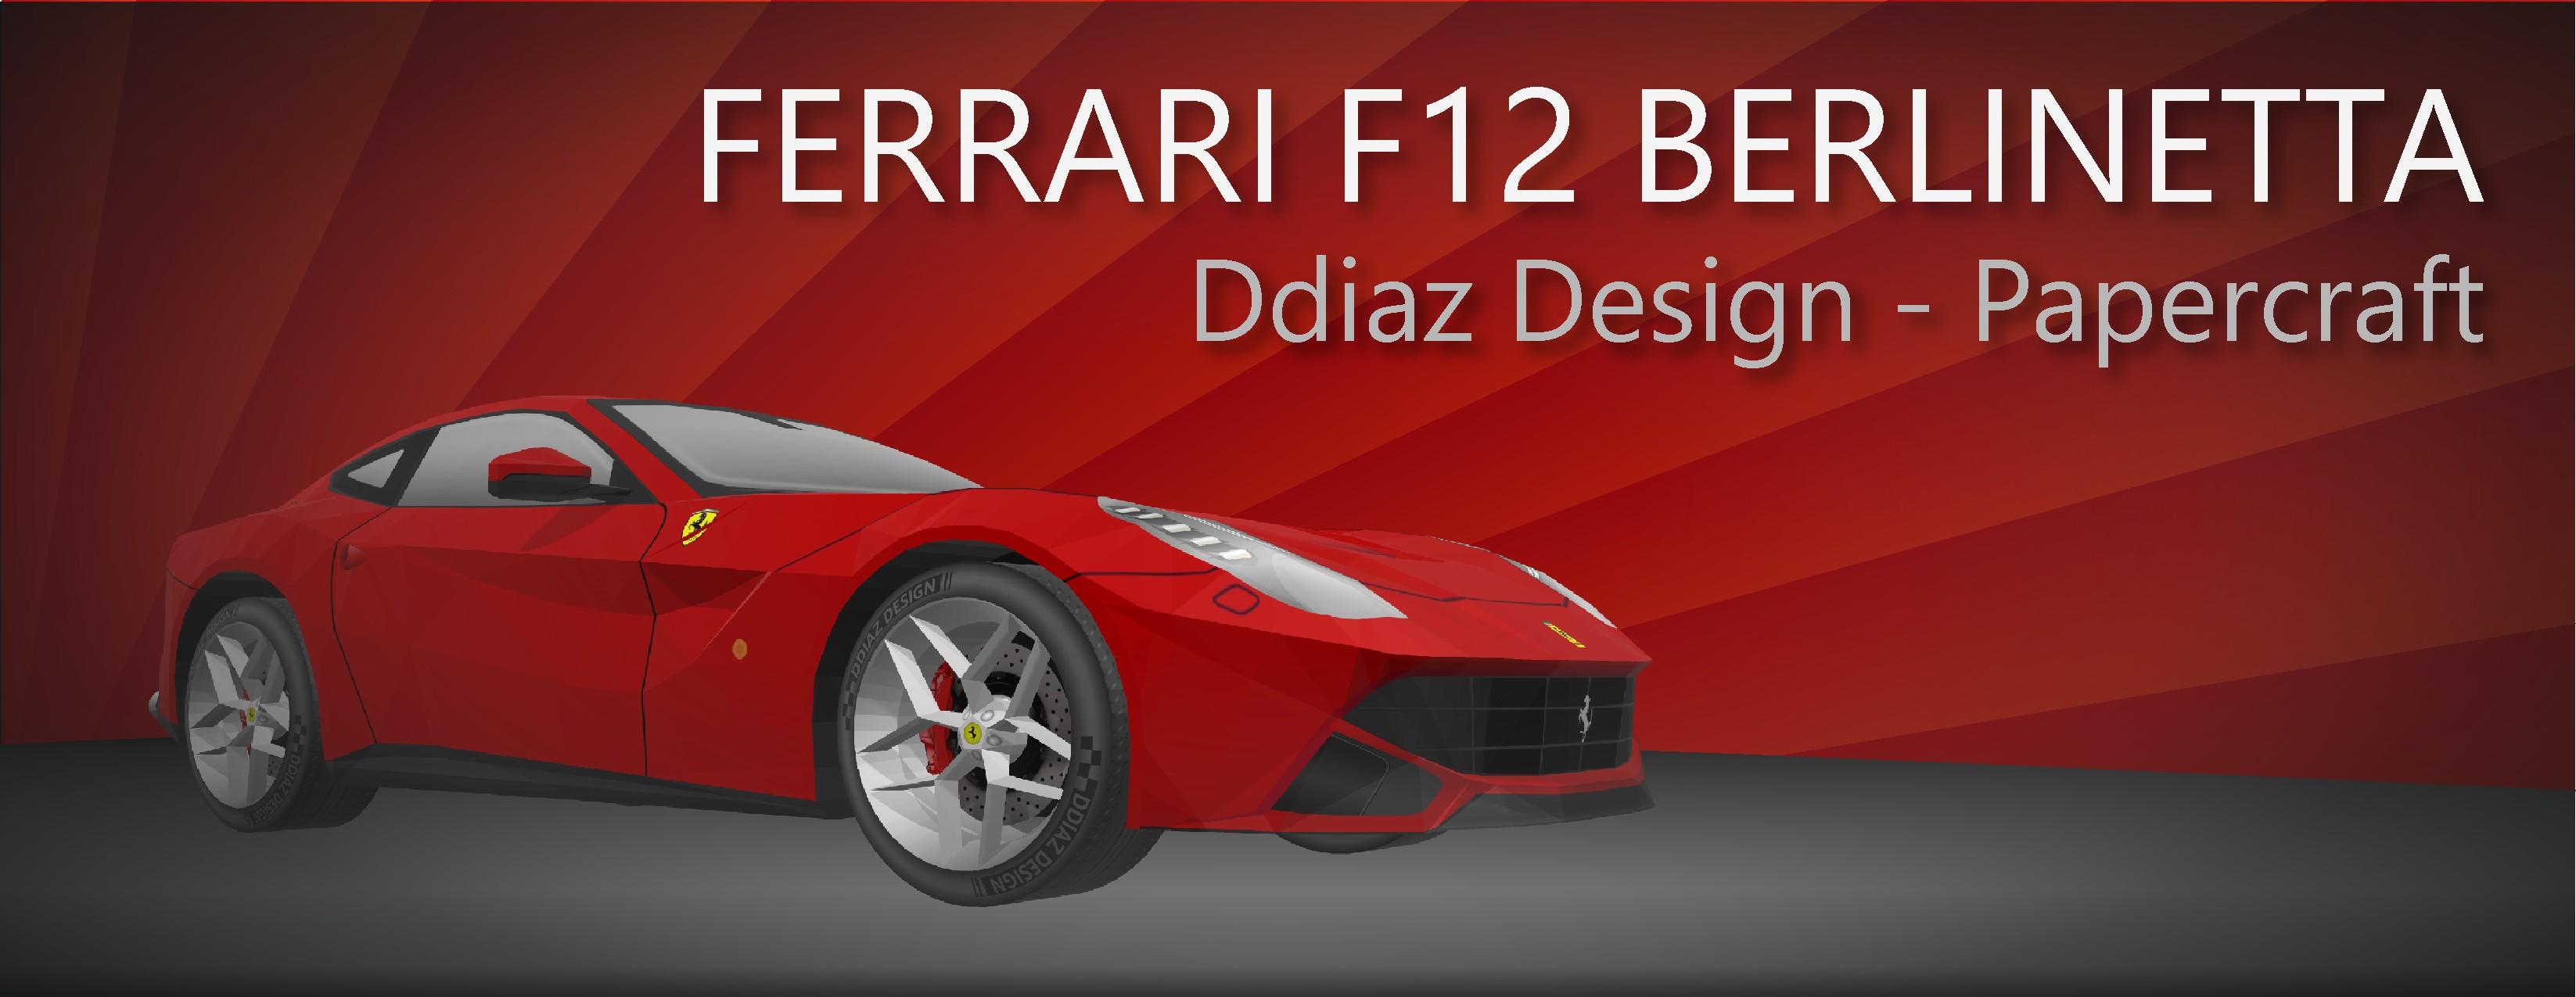 Gta Papercraft Modelo Papercraft Del Ferrari F12 Belinetta Dise±ado Por Ddiaz